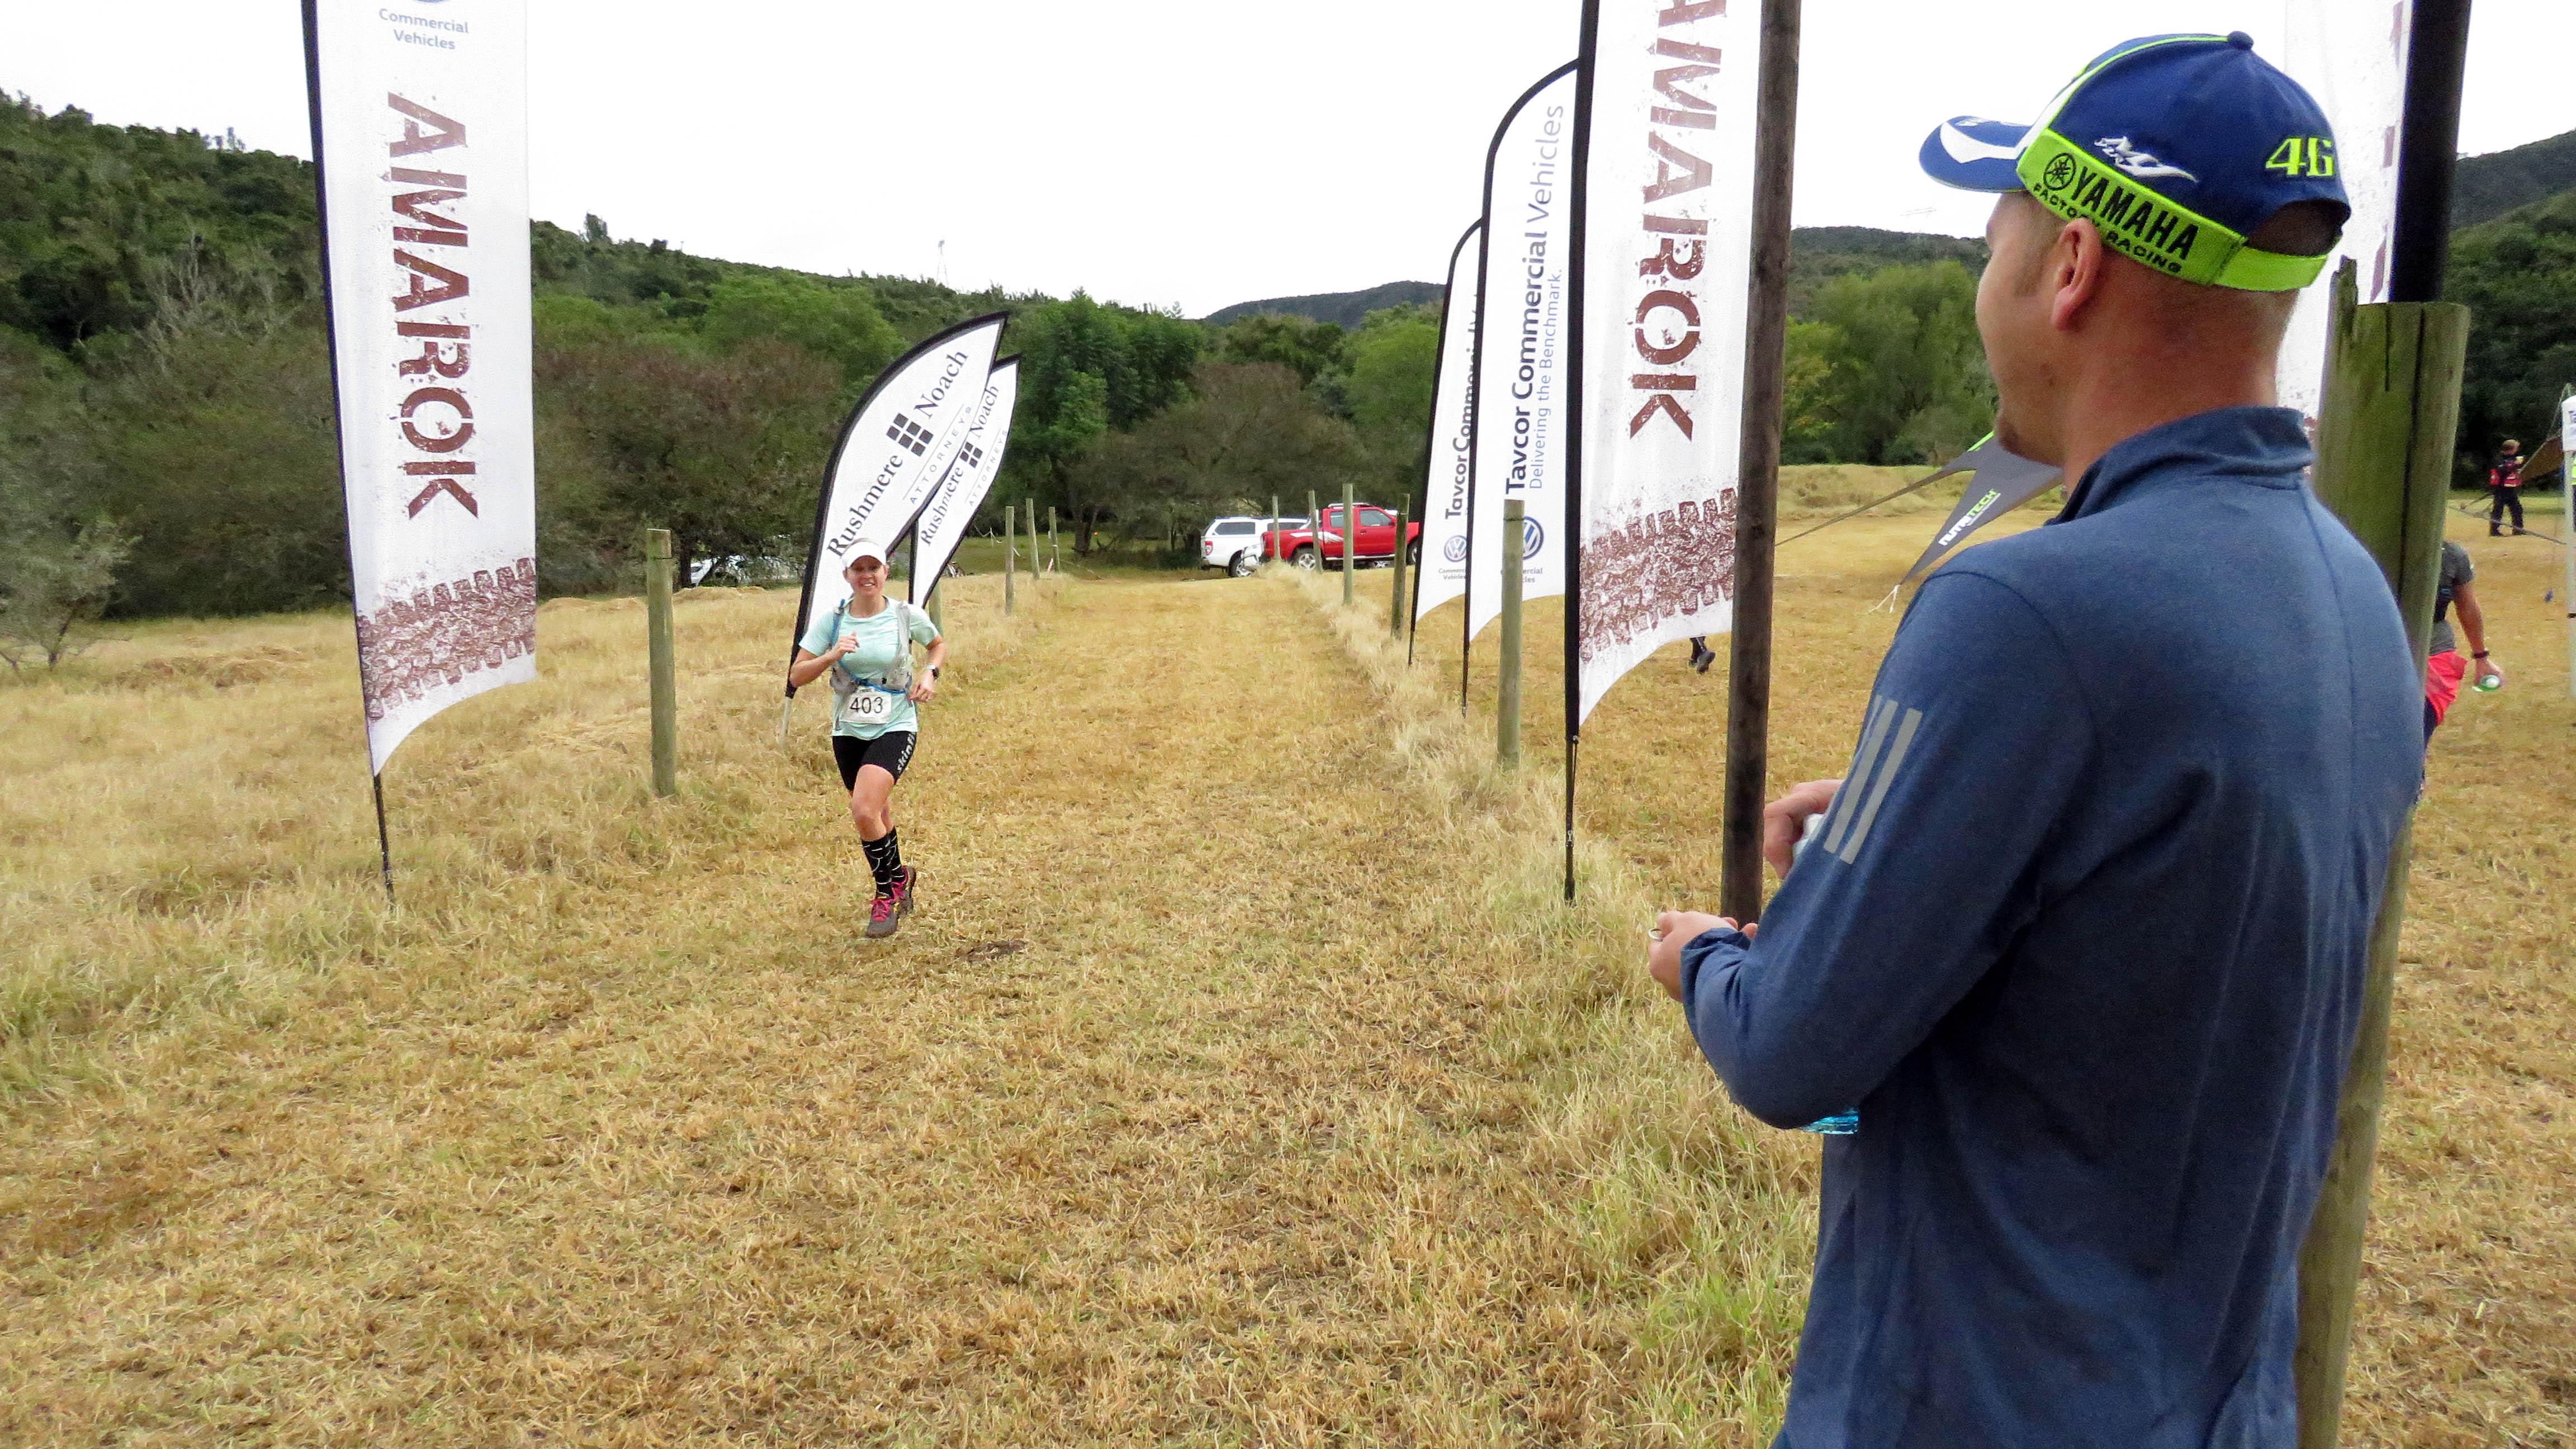 hayterdale trailrun 2018-08-05  (85)